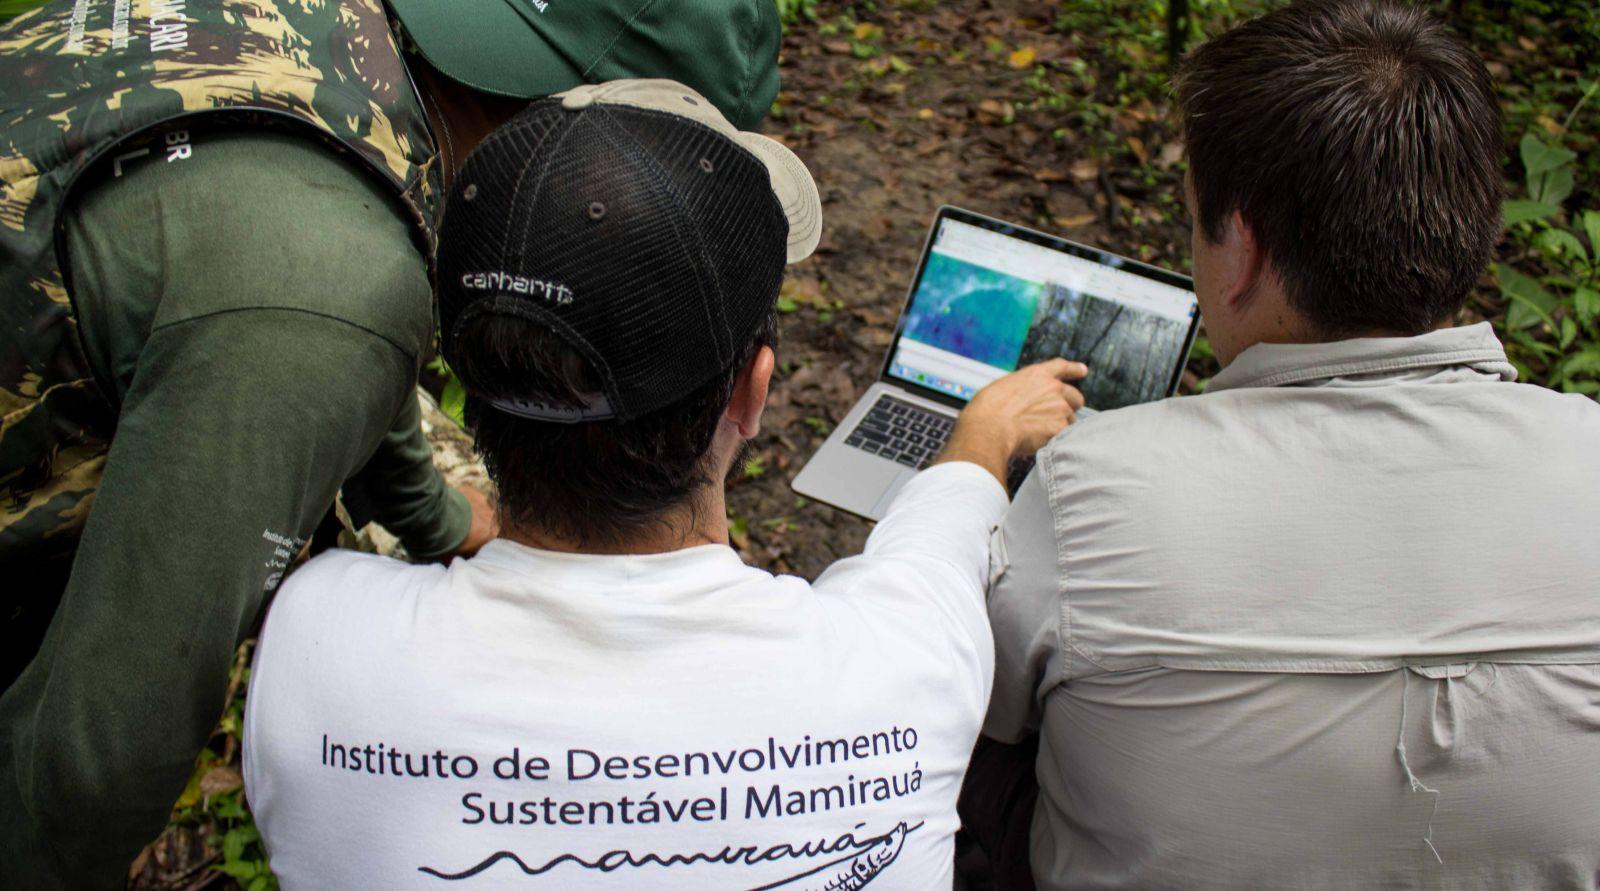 Na SBPC, Instituto Mamirauá apresenta tecnologia de monitoramento para a Amazônia